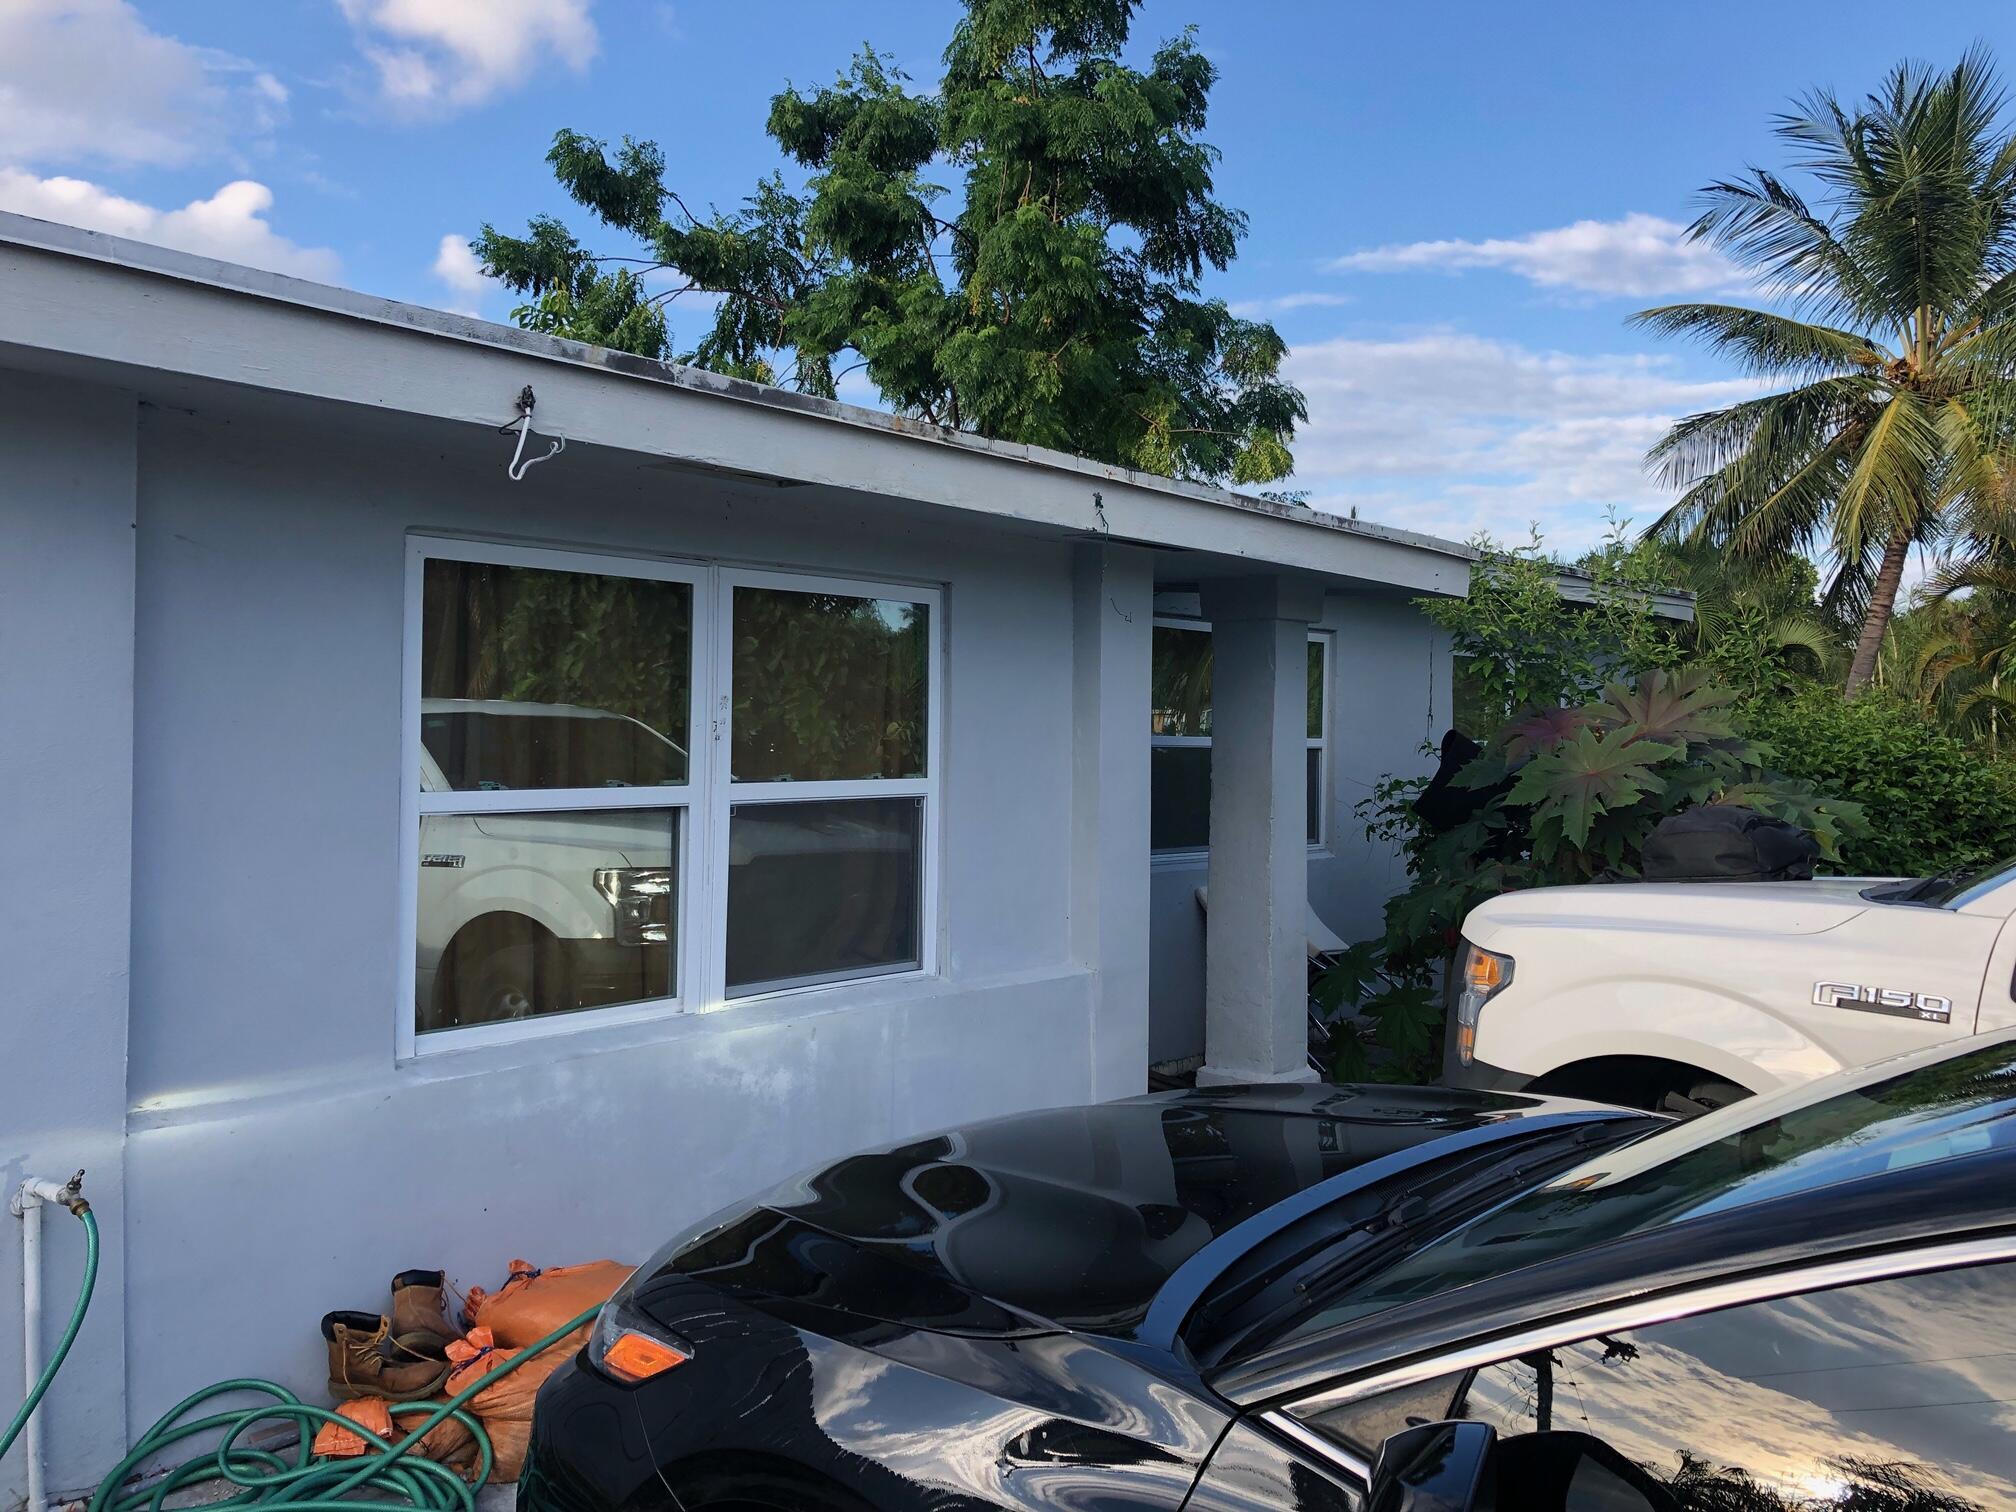 165 N Palm Drive  For Sale 10752749, FL